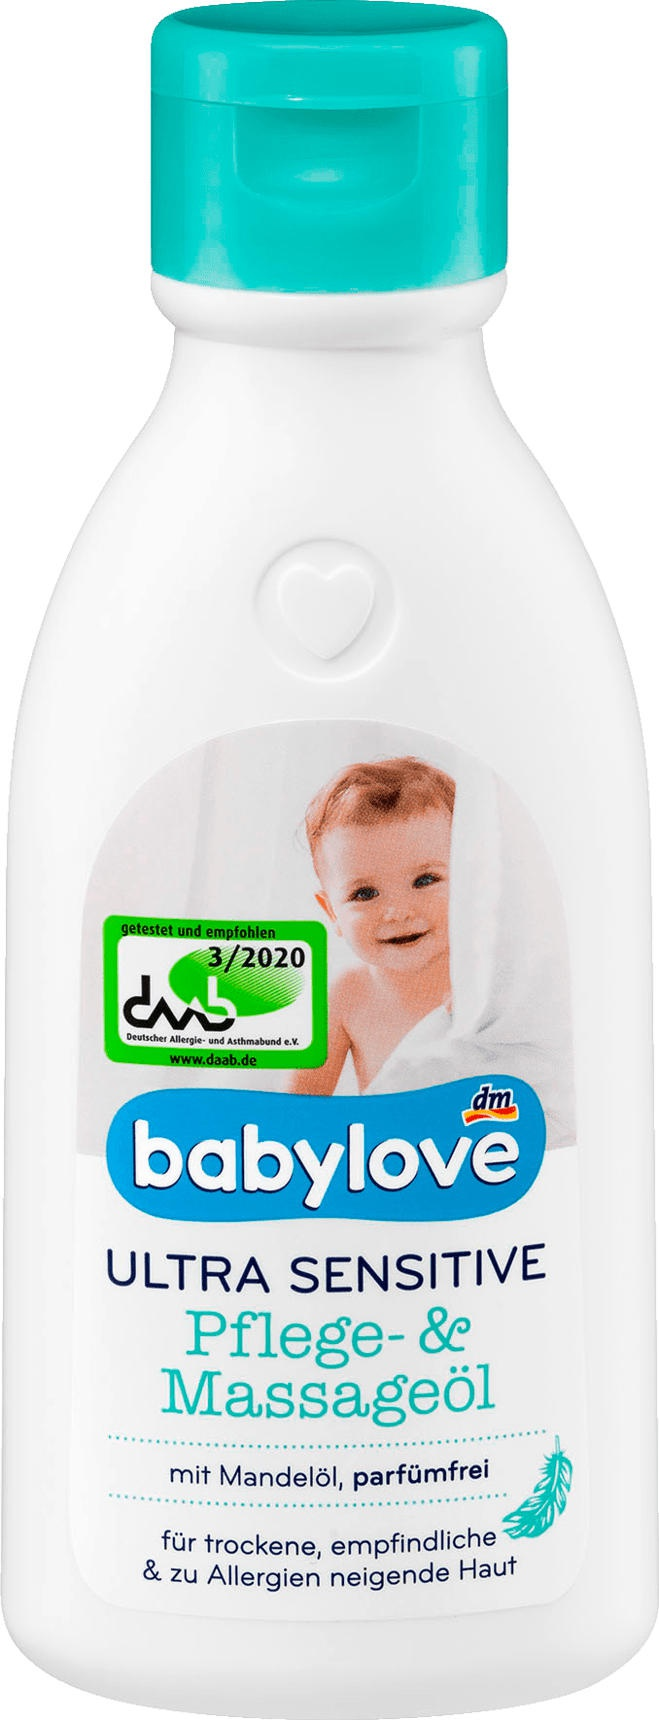 Babylove Ultra Sensitiv Pflege- Und Massageöl